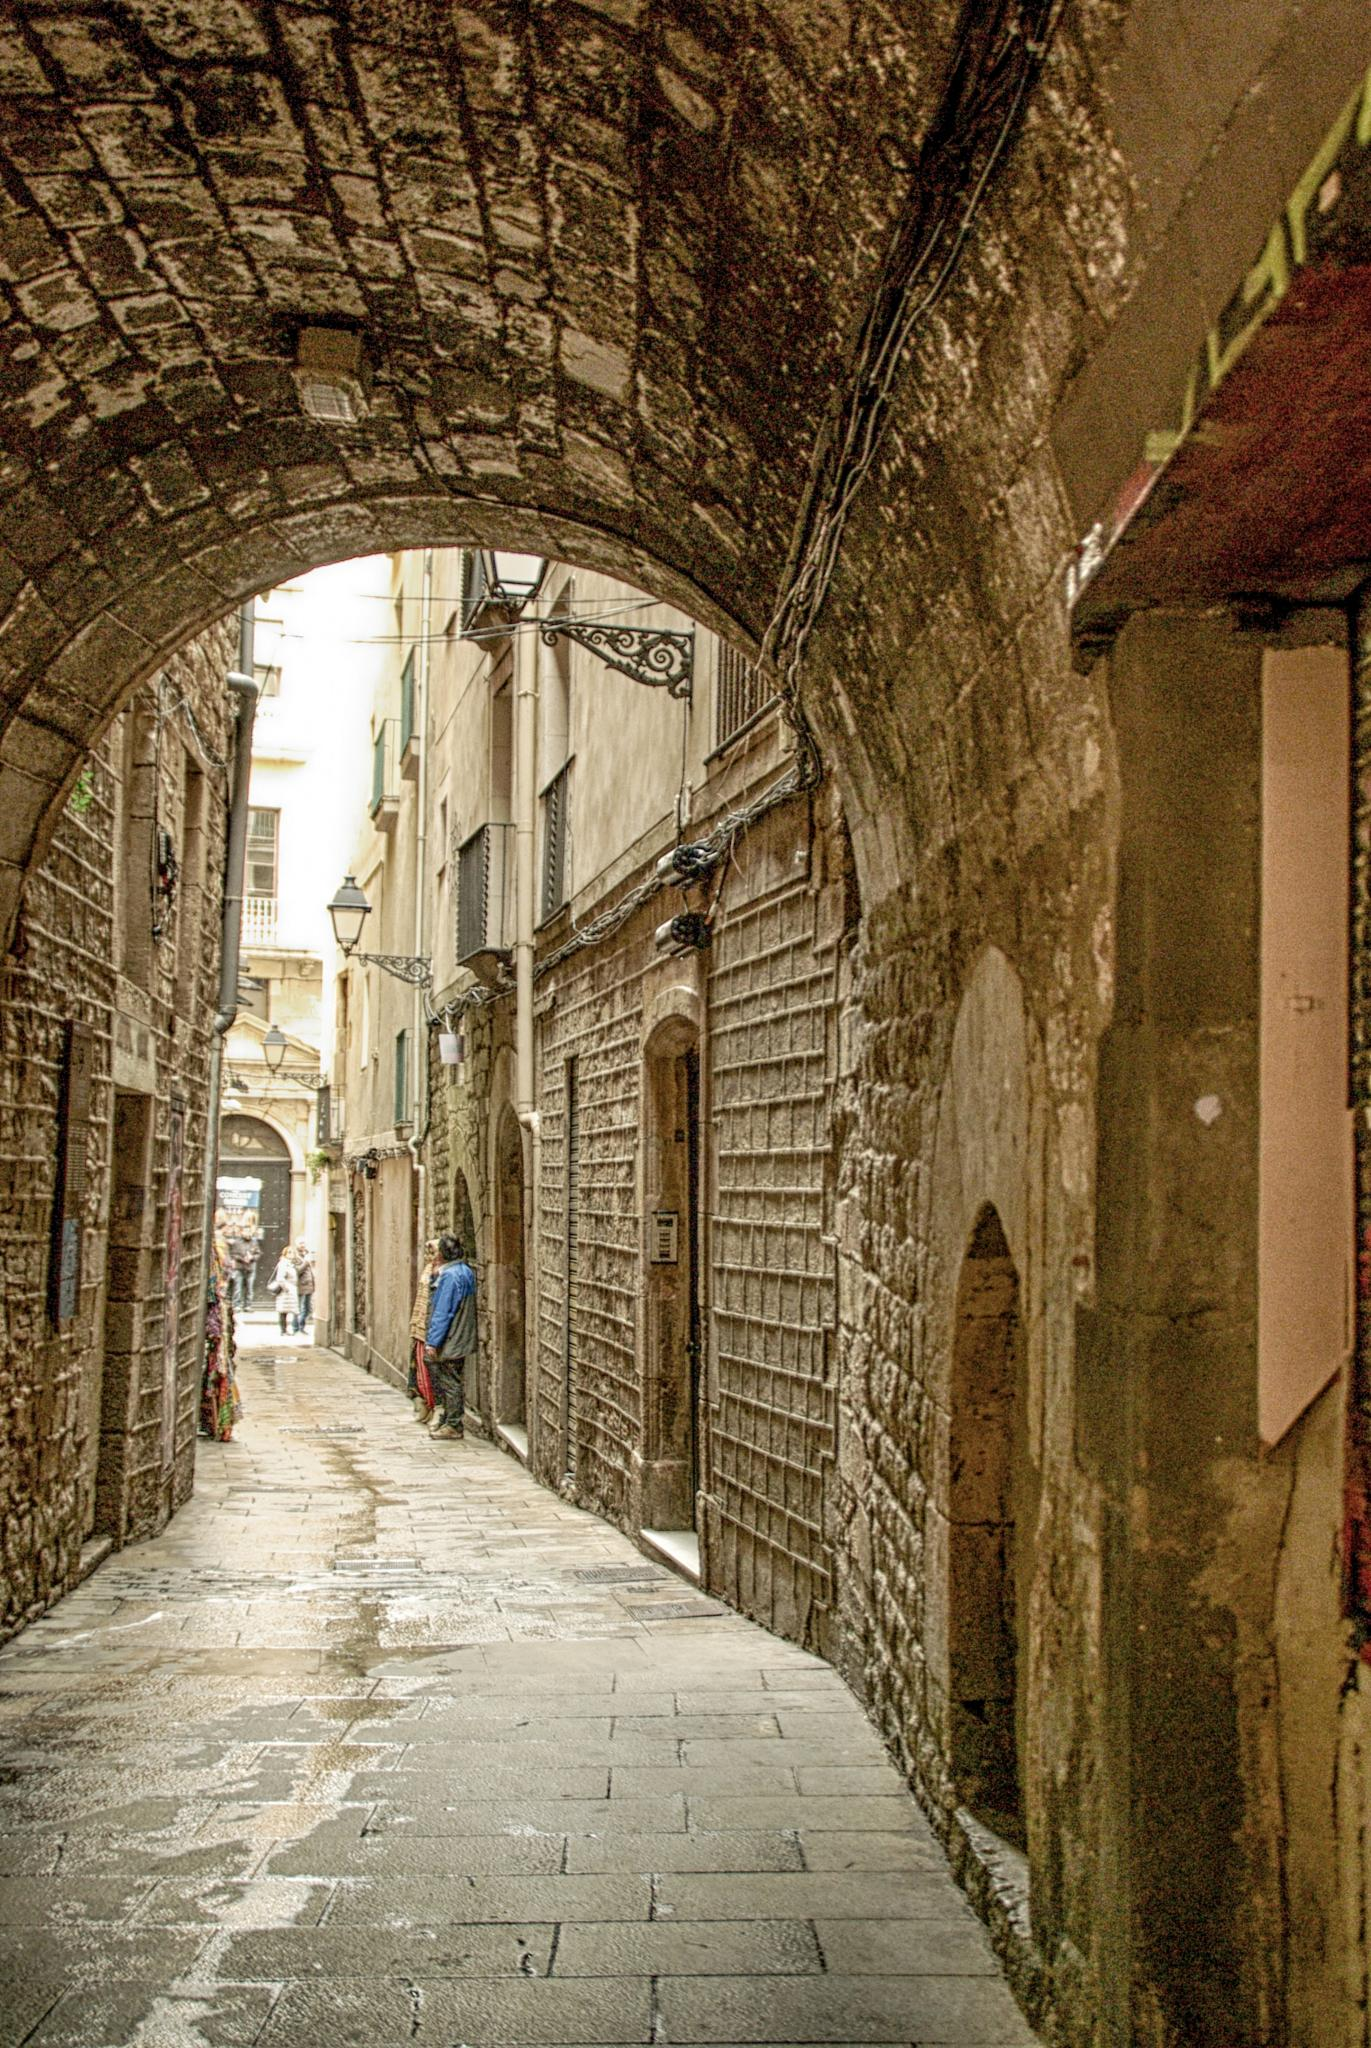 Alleys - 01 by Aker